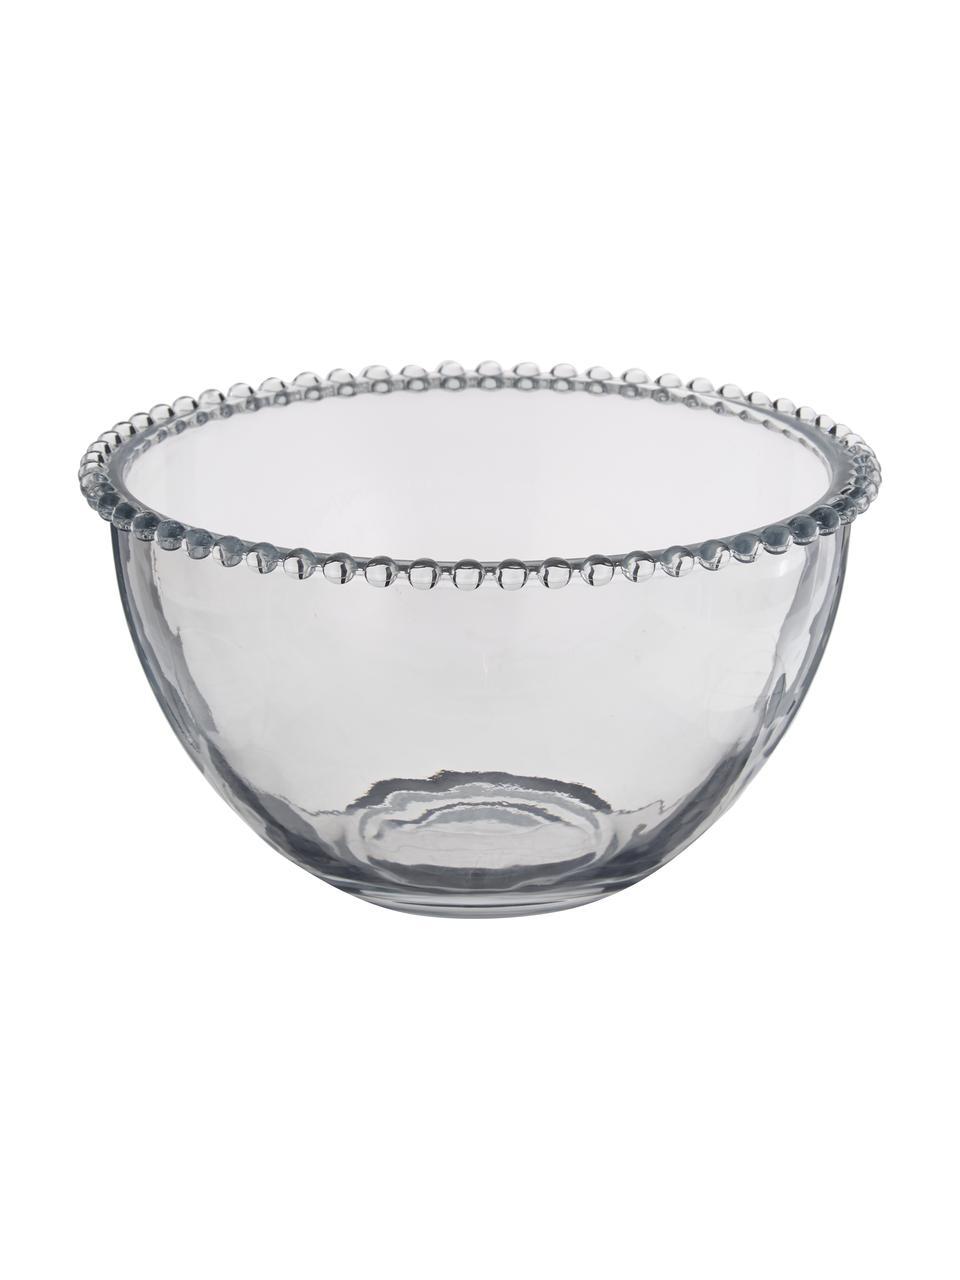 Miska ze szkła Perles, Transparentny, Ø 21 cm